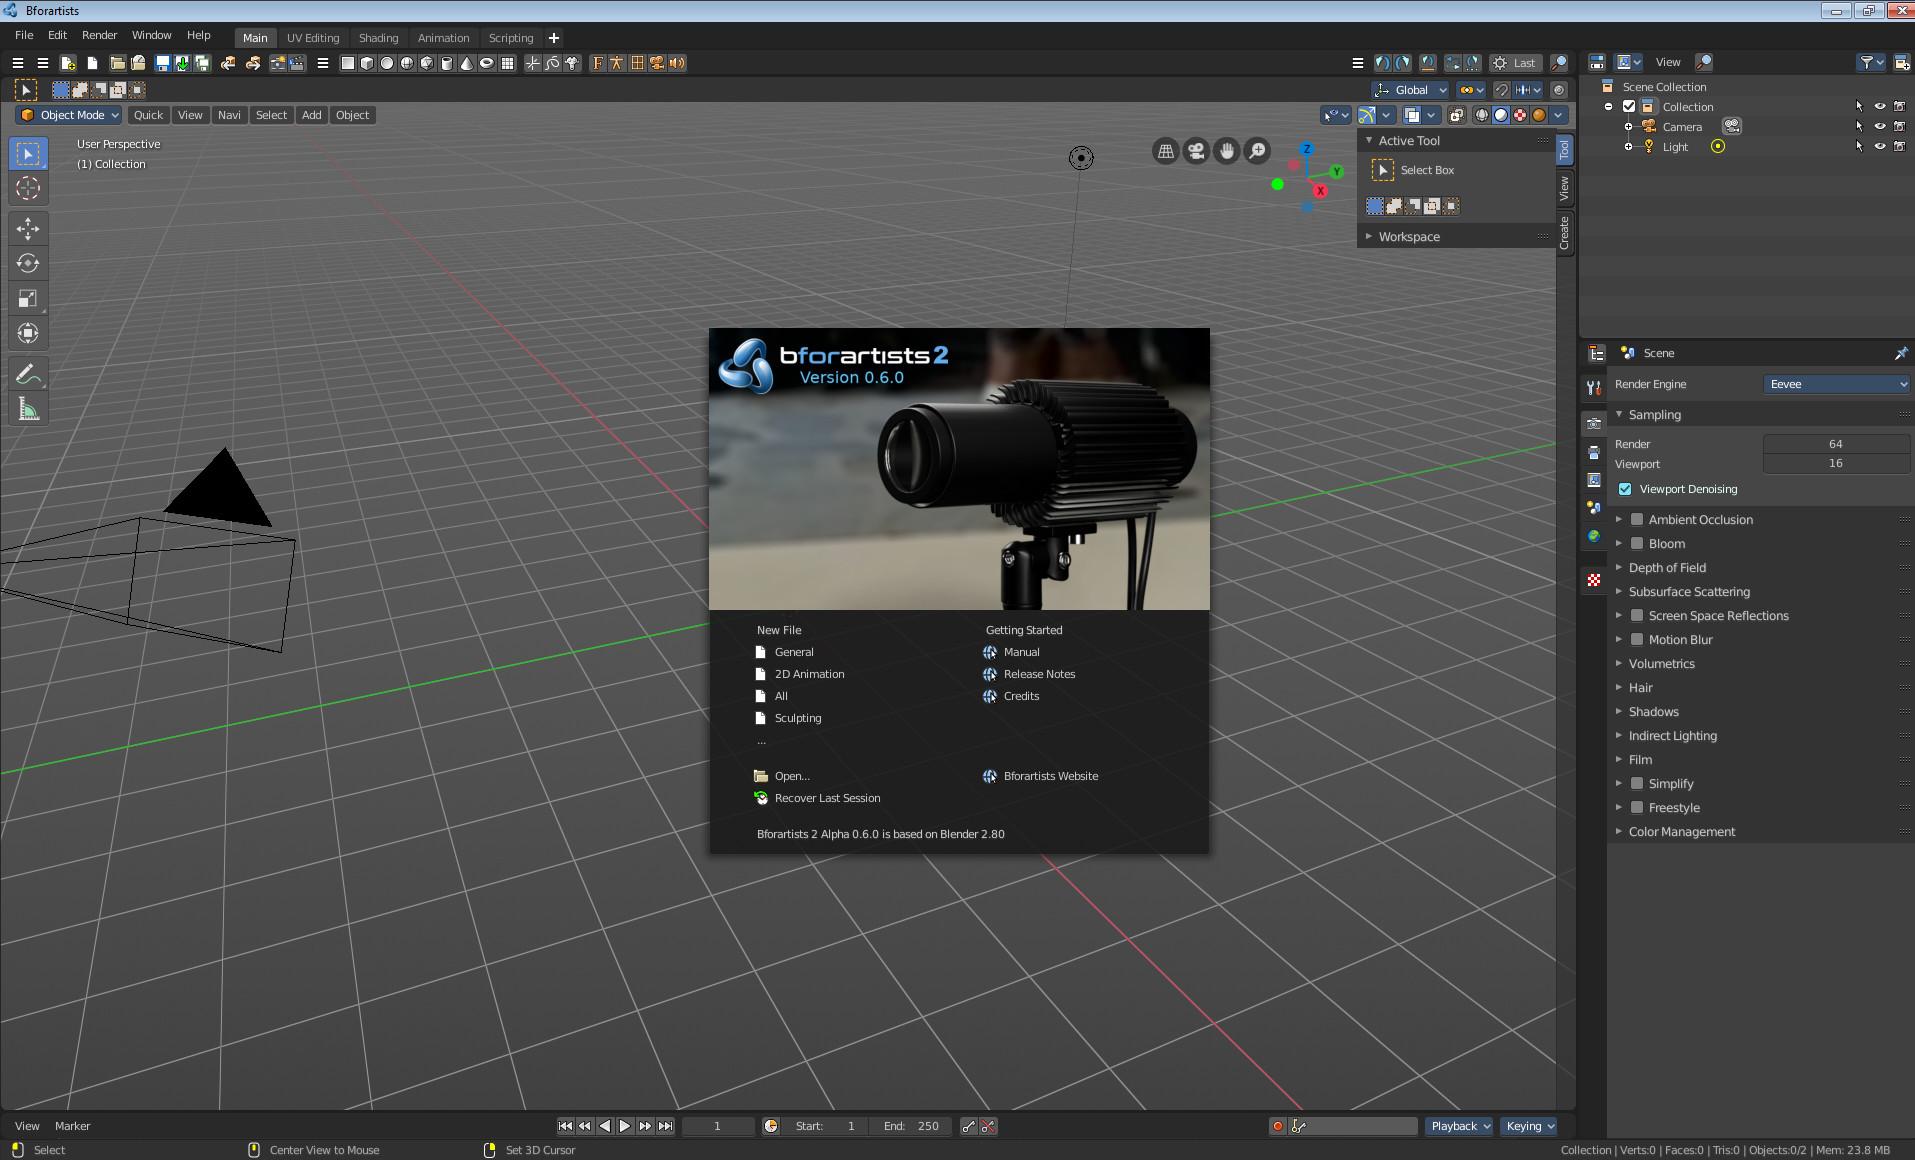 Bforartists 2 Alpha 0.6.0 released